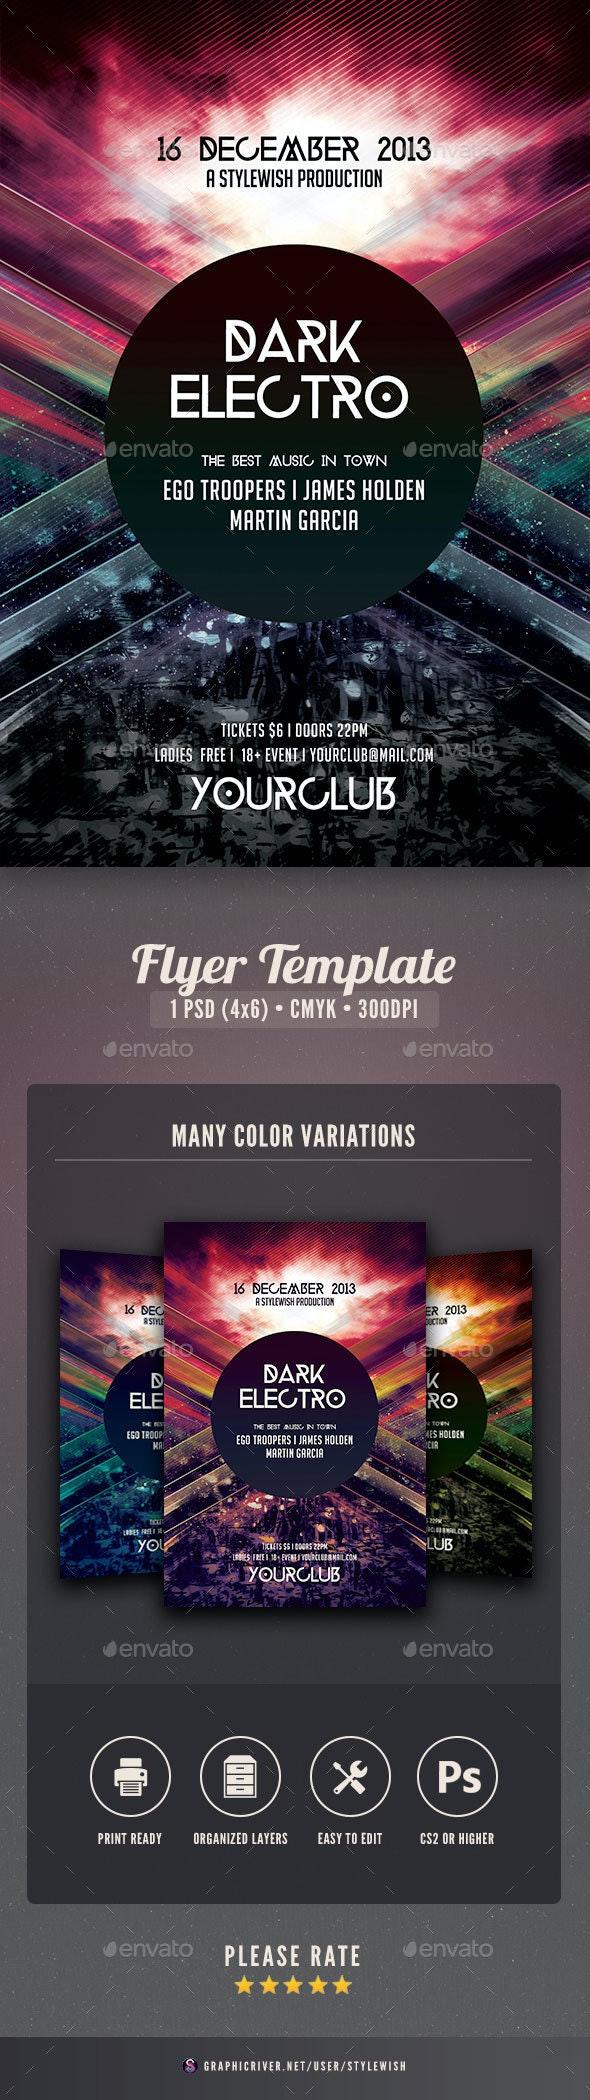 Dark Electro Flyer - Clubs & Parties Events